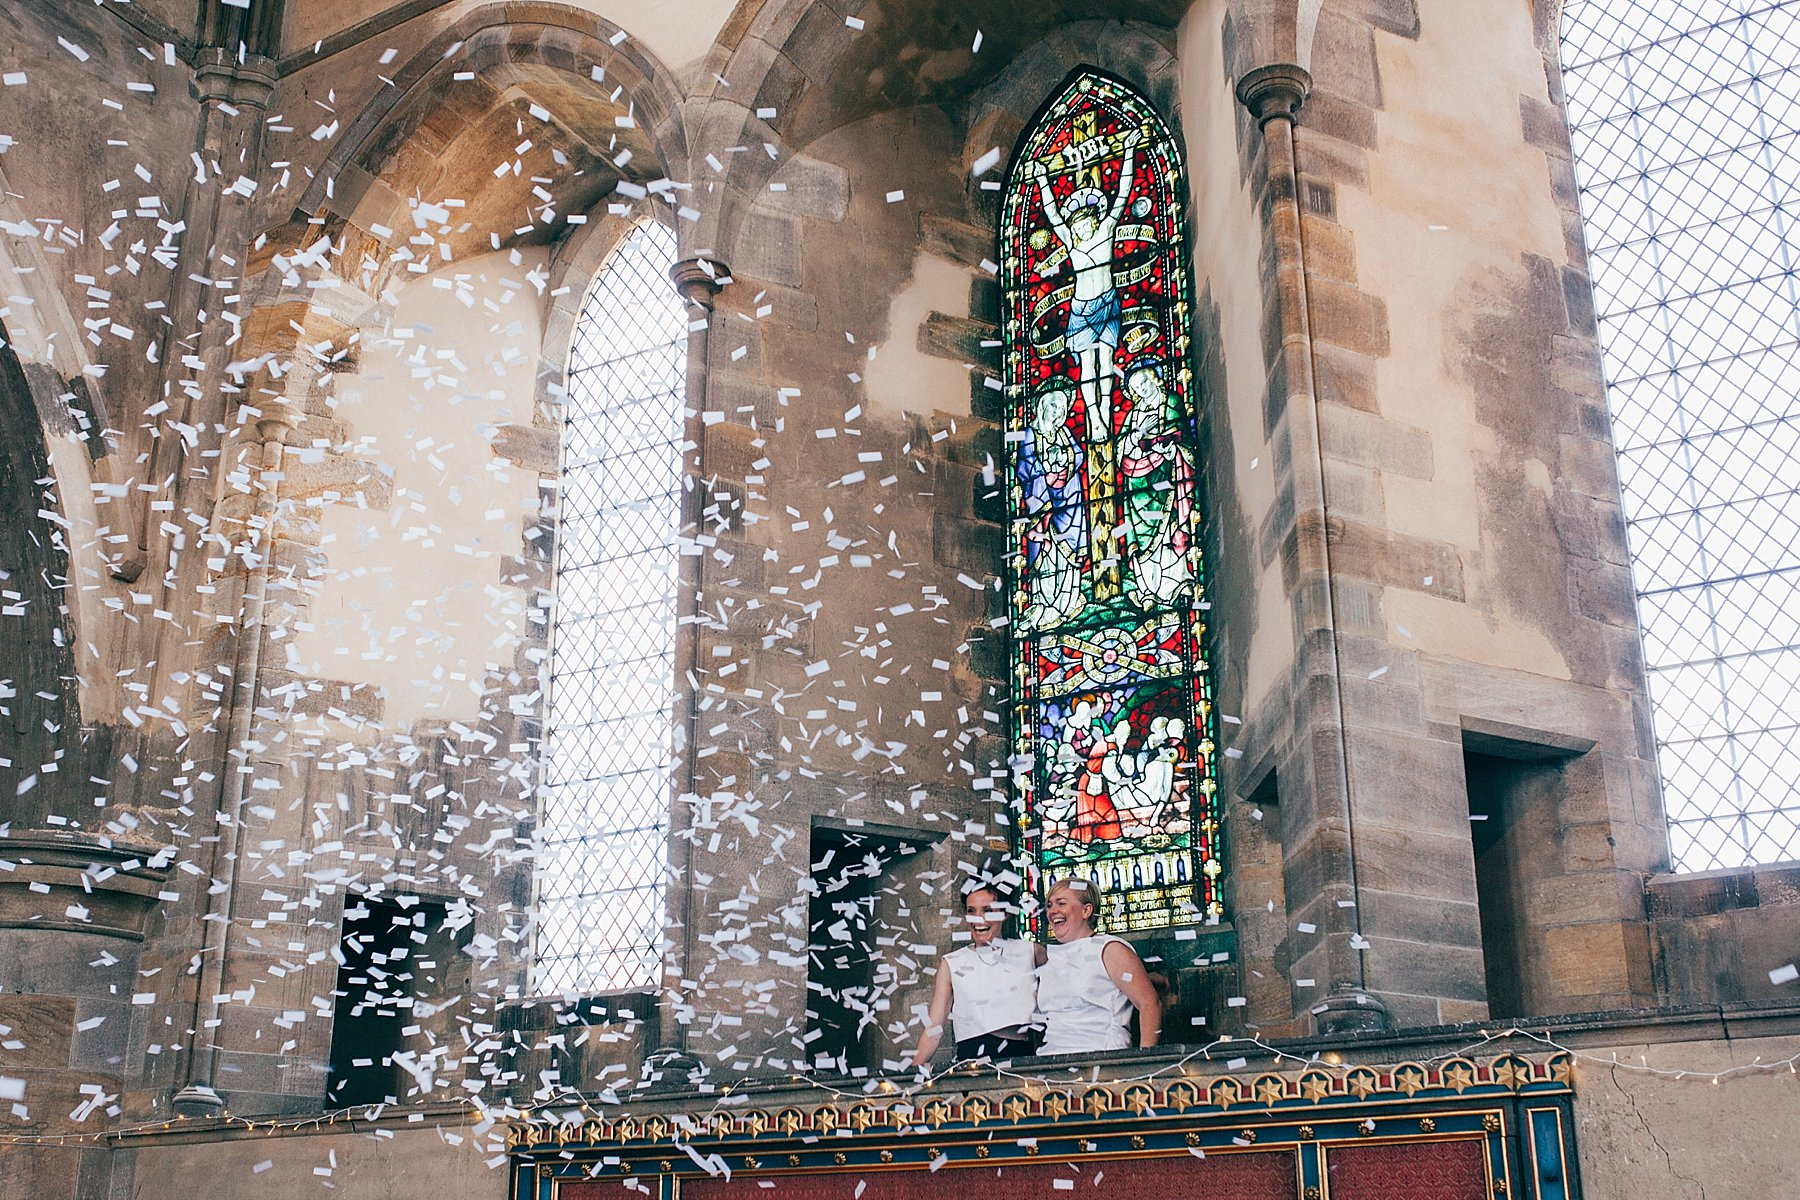 CV-381 Left Bank Leeds arts wedding venue couple enter confetti cannon.jpg